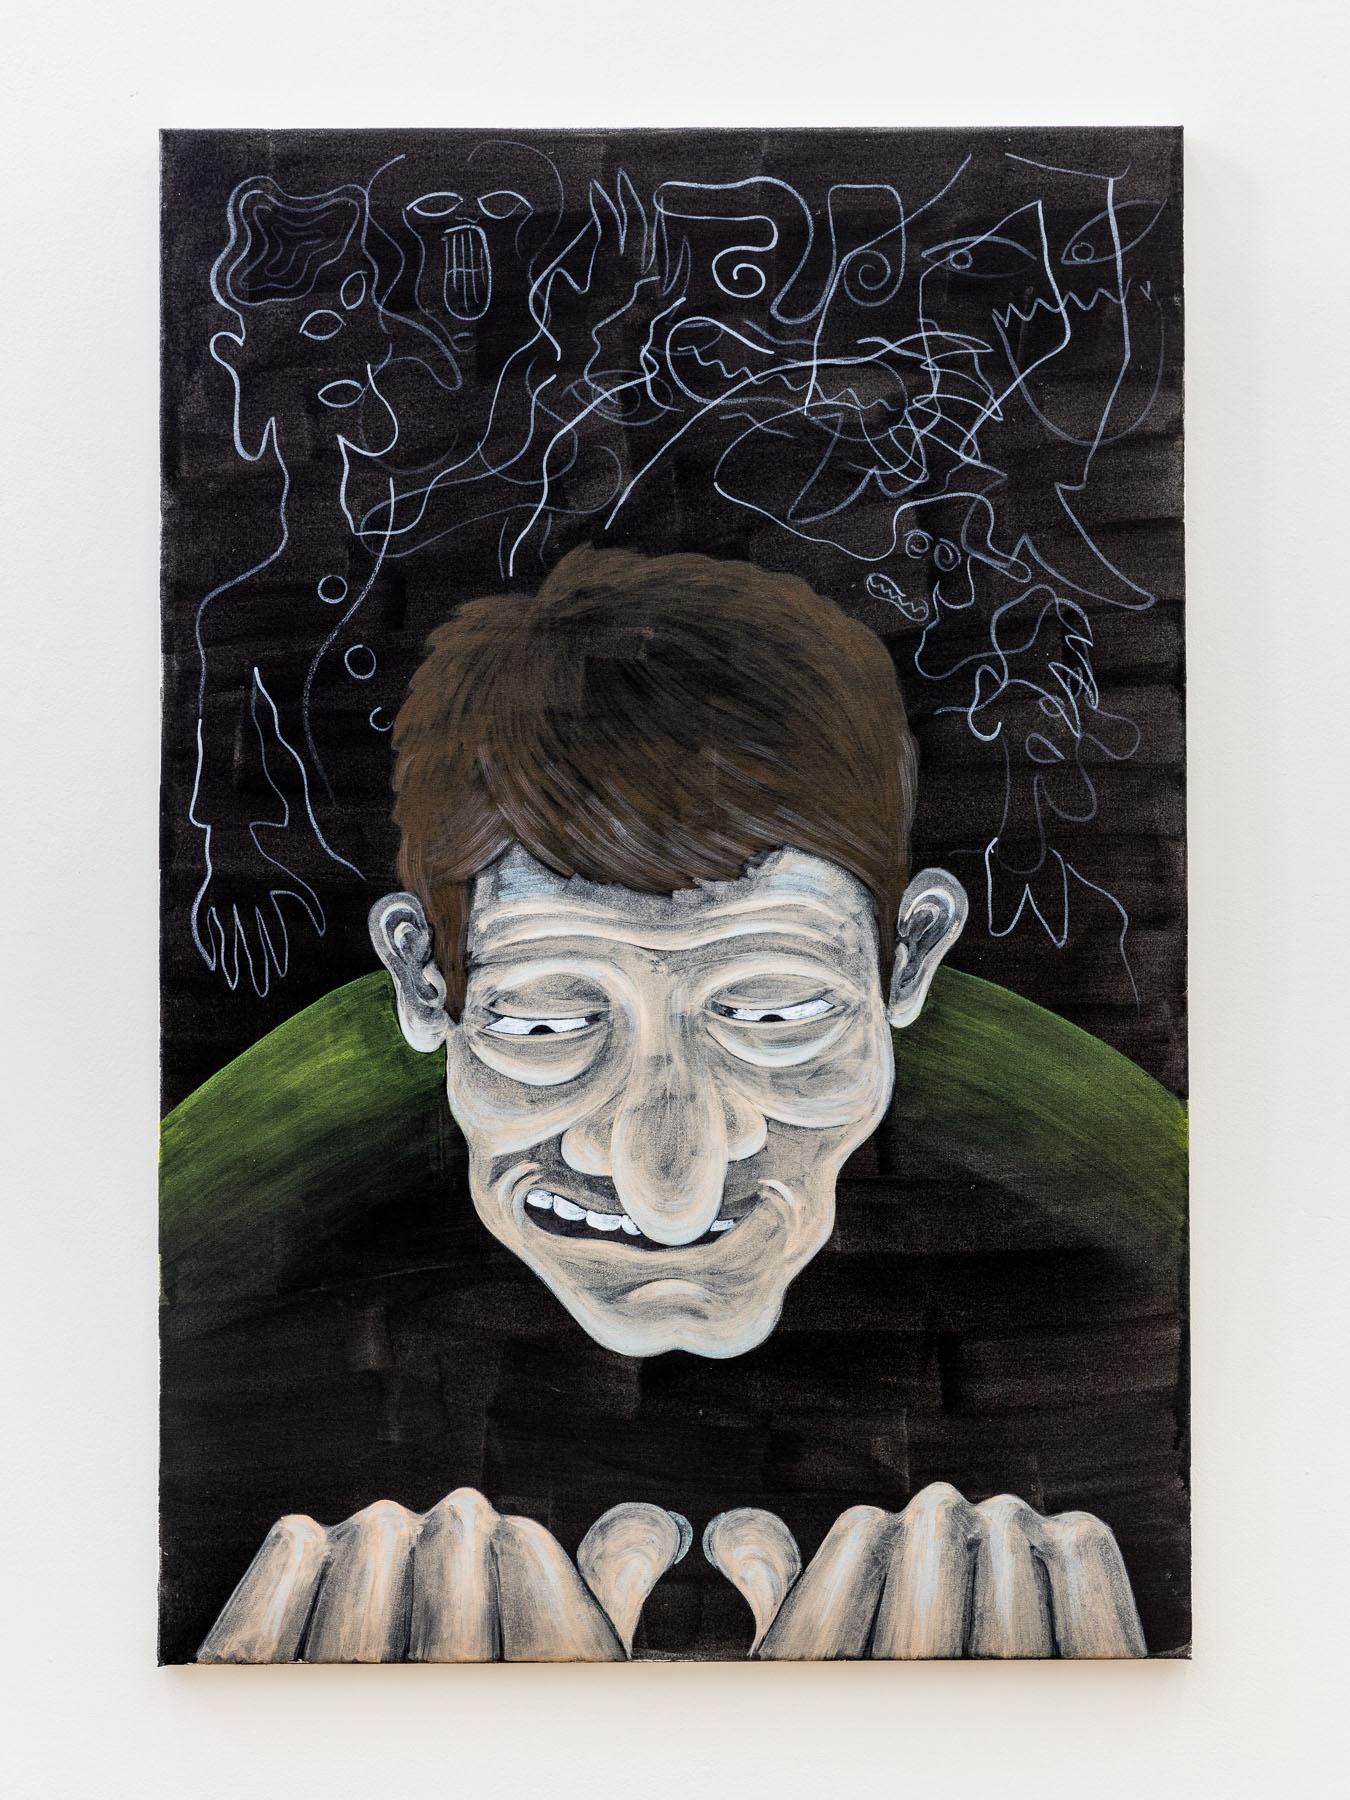 Stefan Fuchs, Part time painter, 2017, Acrylic and watercolor pencil on canvas, 90 x 60 cm